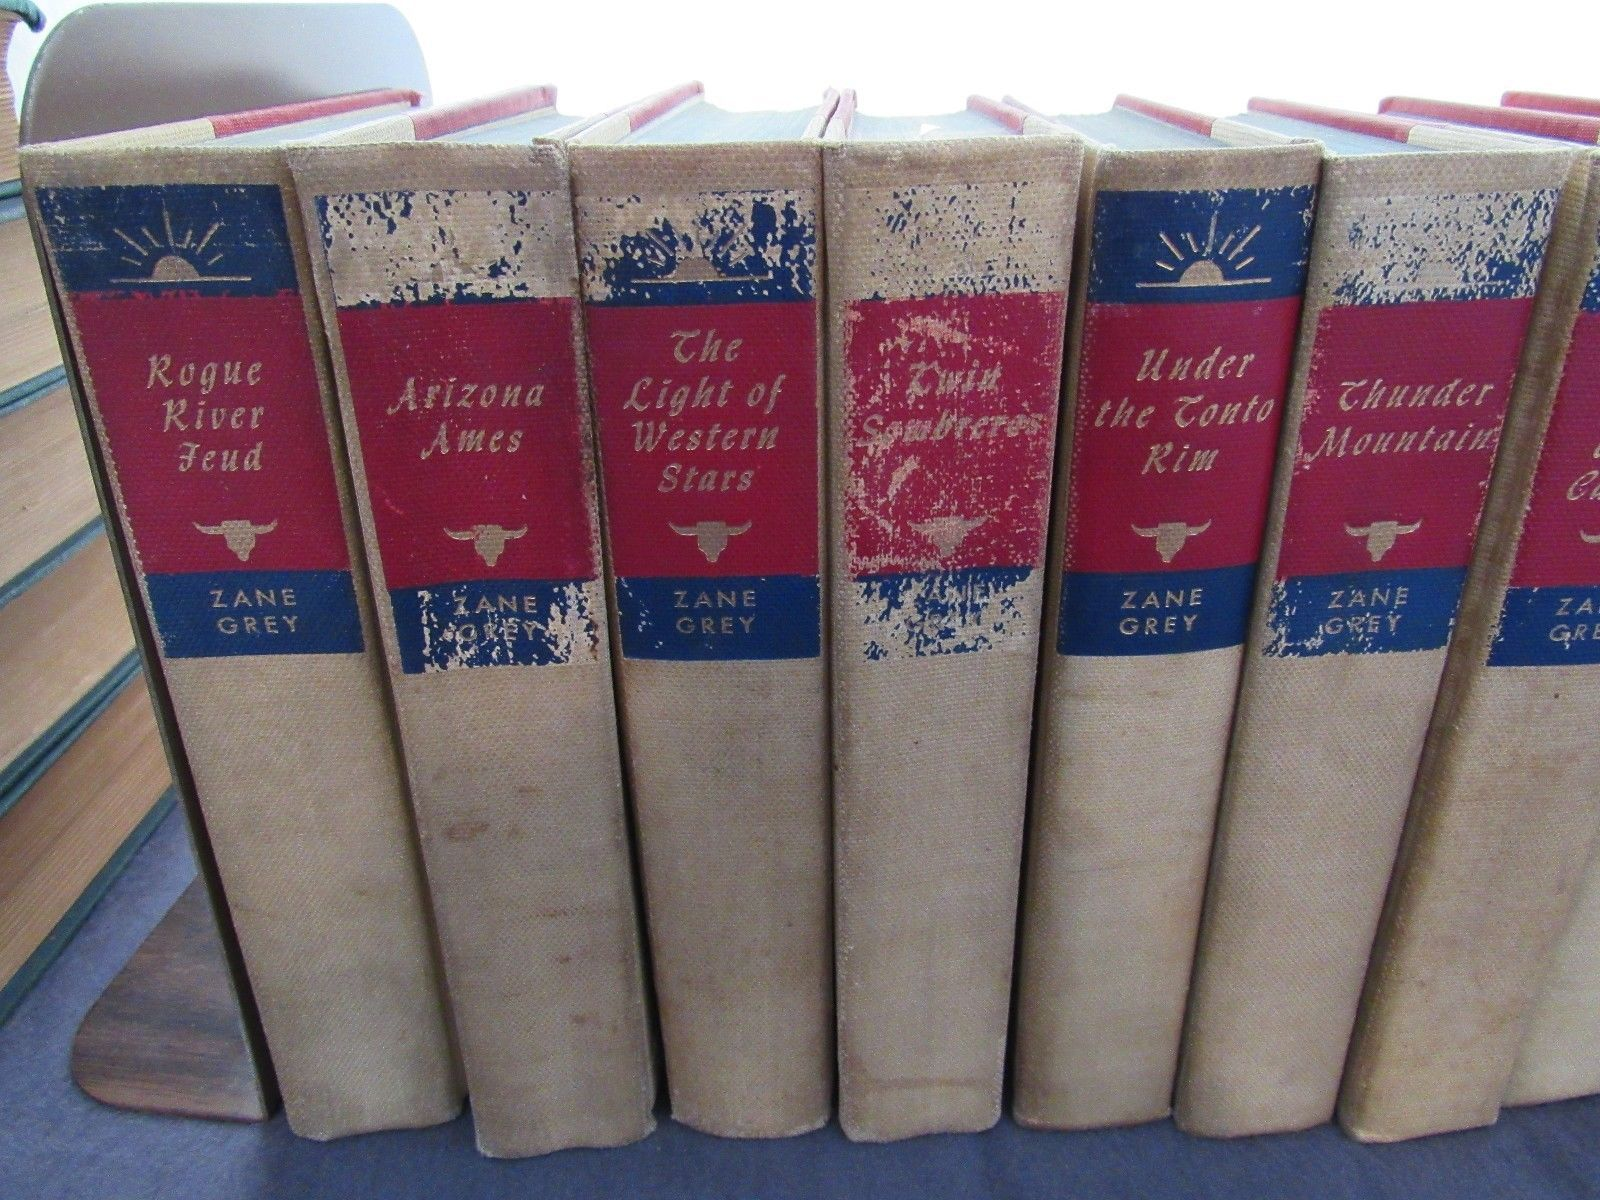 Vintage set of 24 Zane Grey Western HC Books Black's Readers Service Company